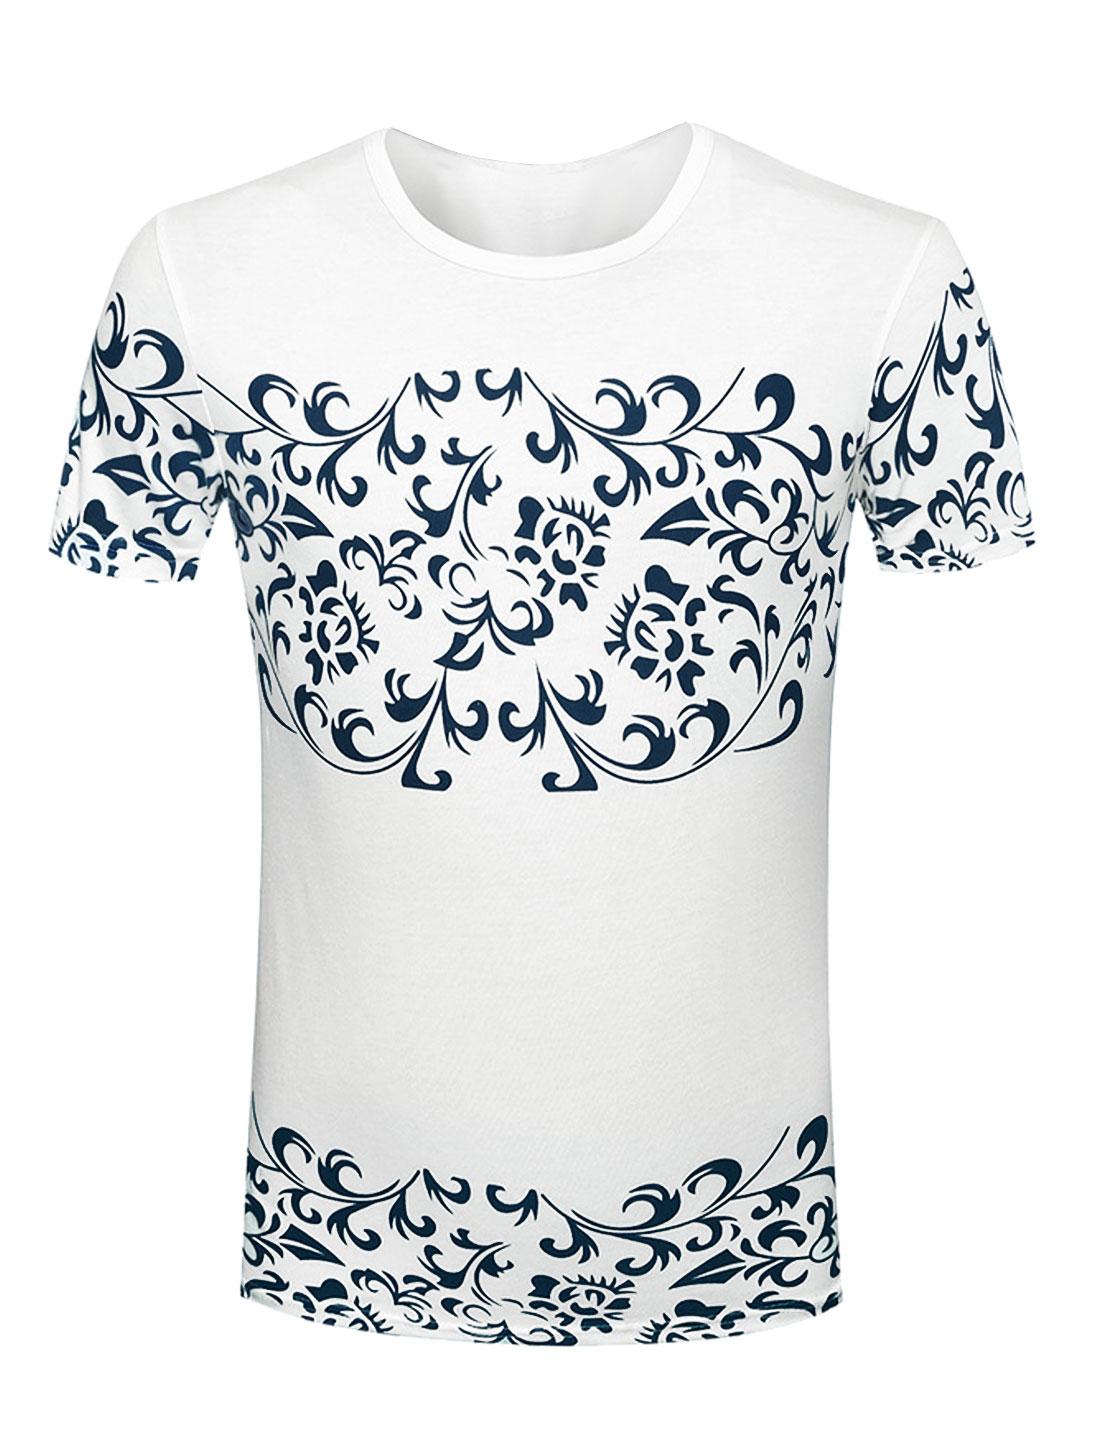 Man Floral Prints Round Neck Short Sleeves Slipover Tee Whites M